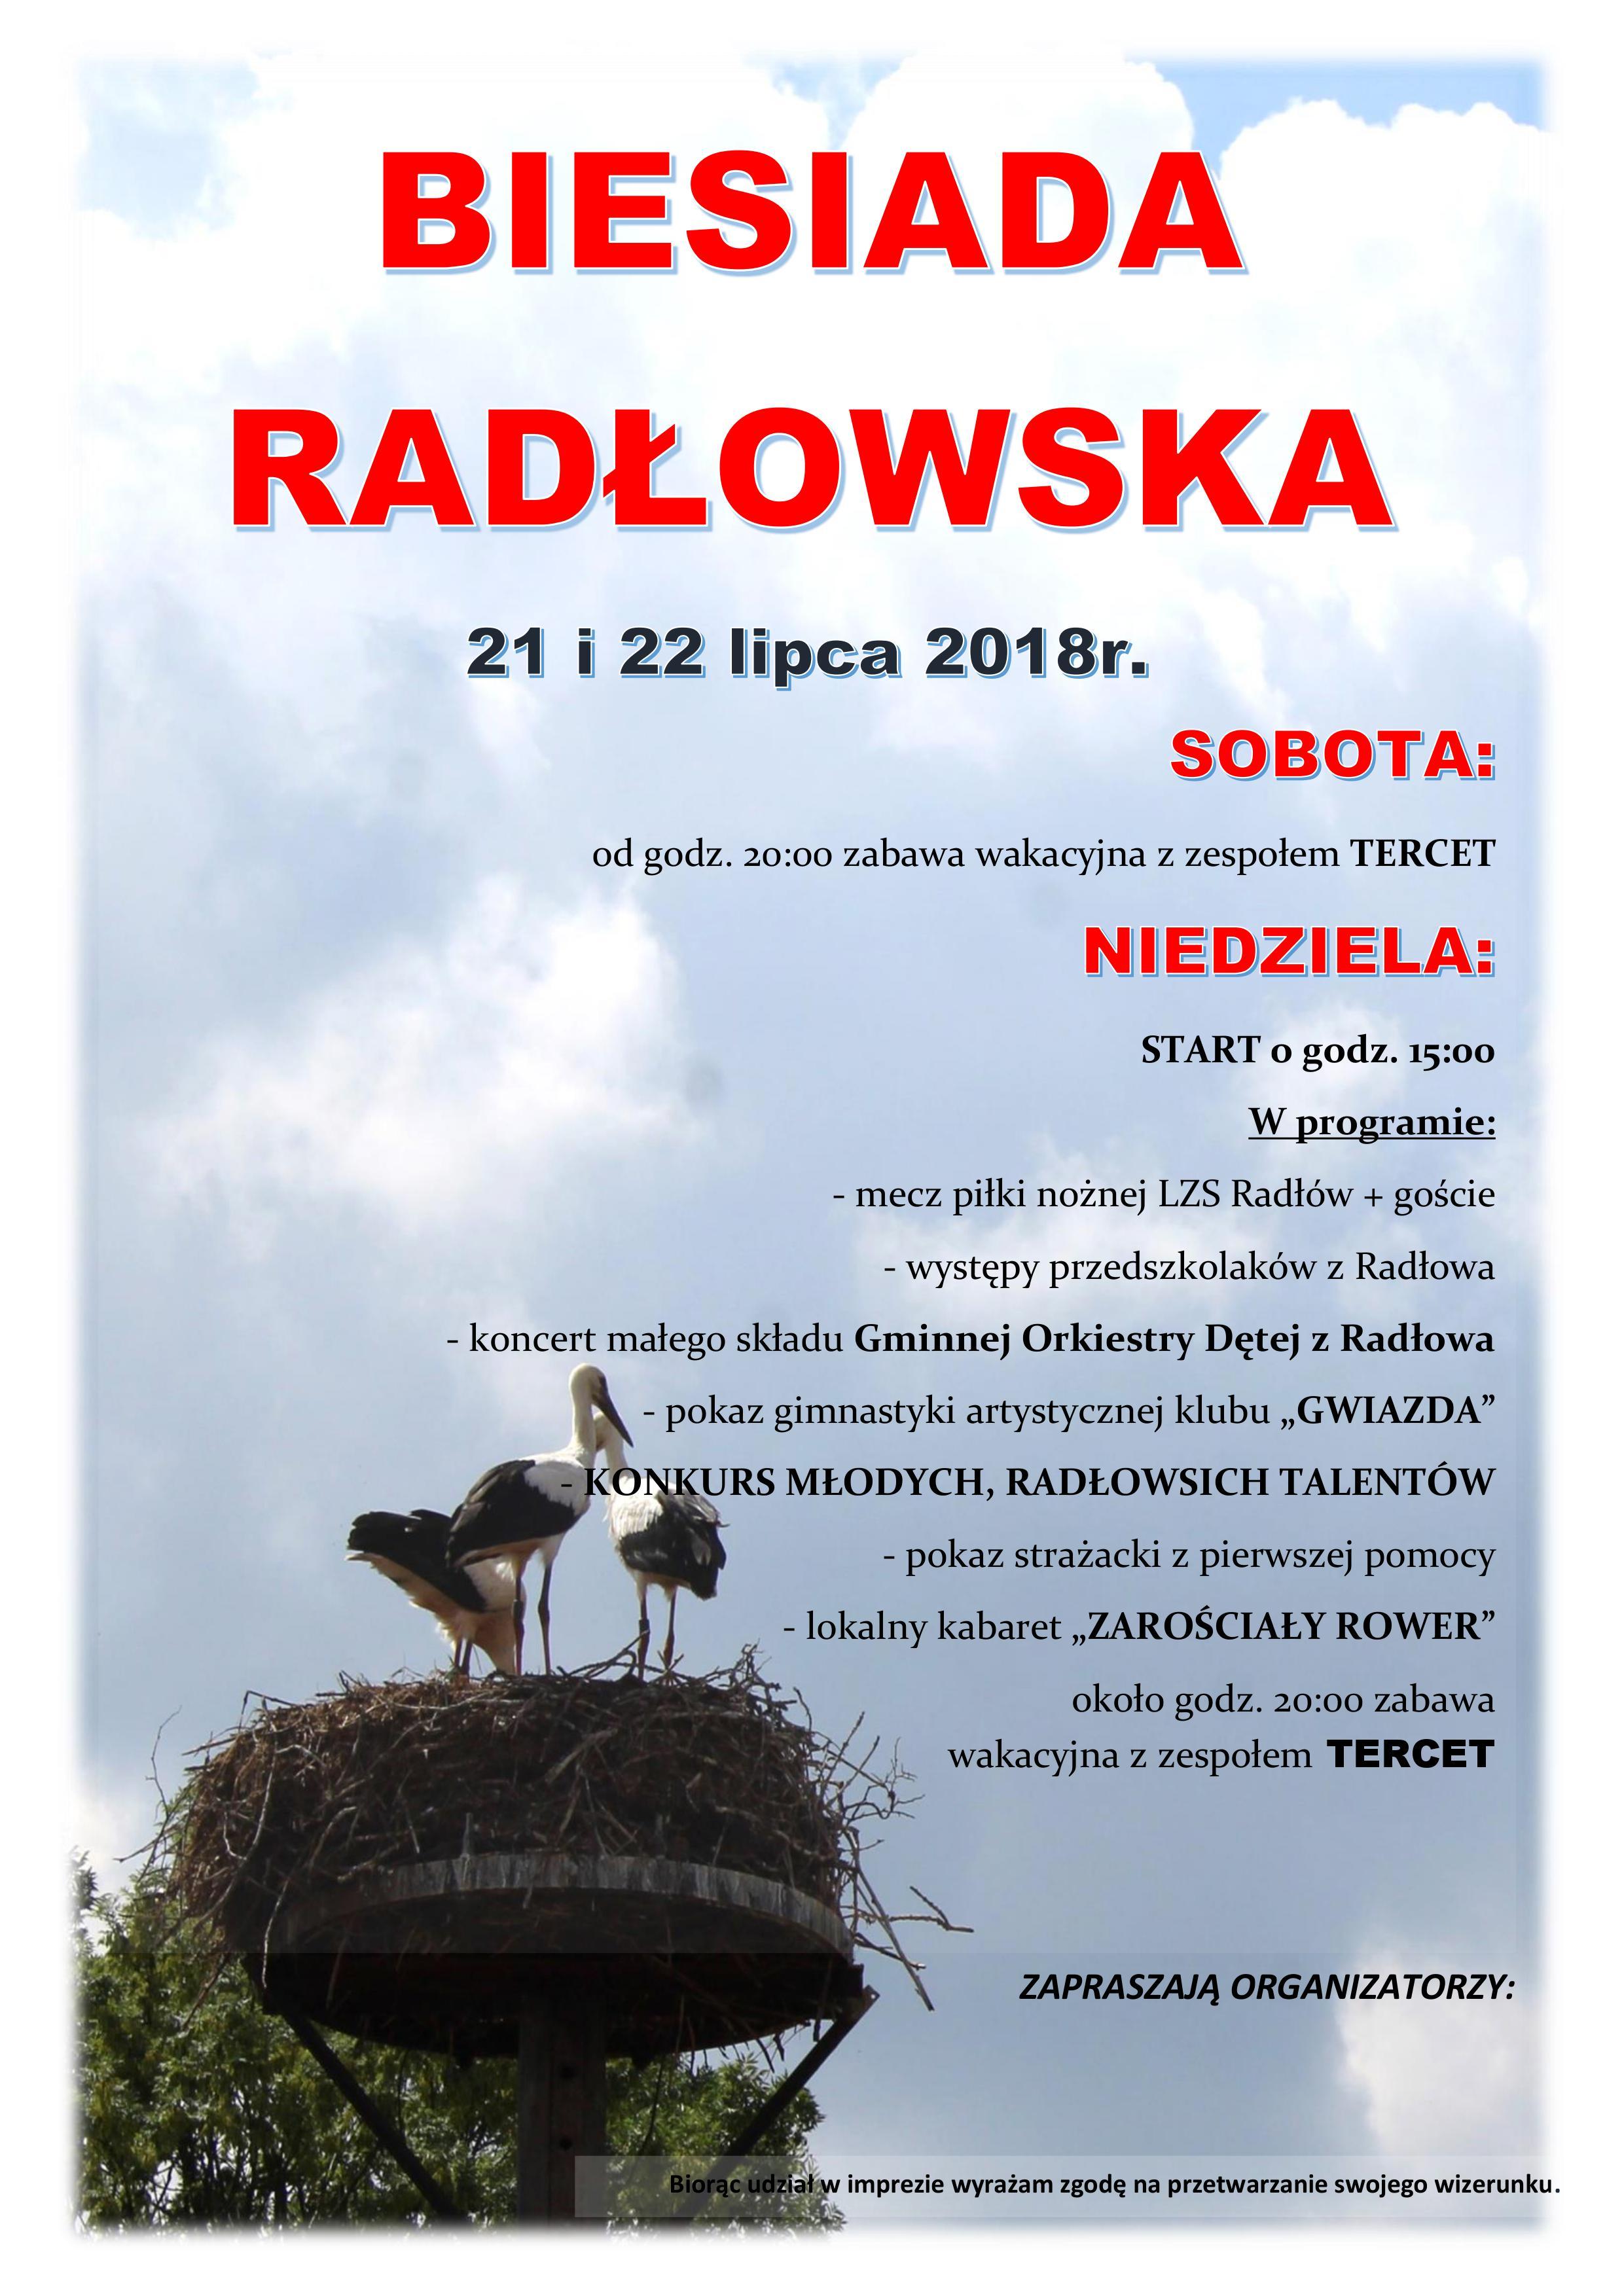 biesiada_radlowska